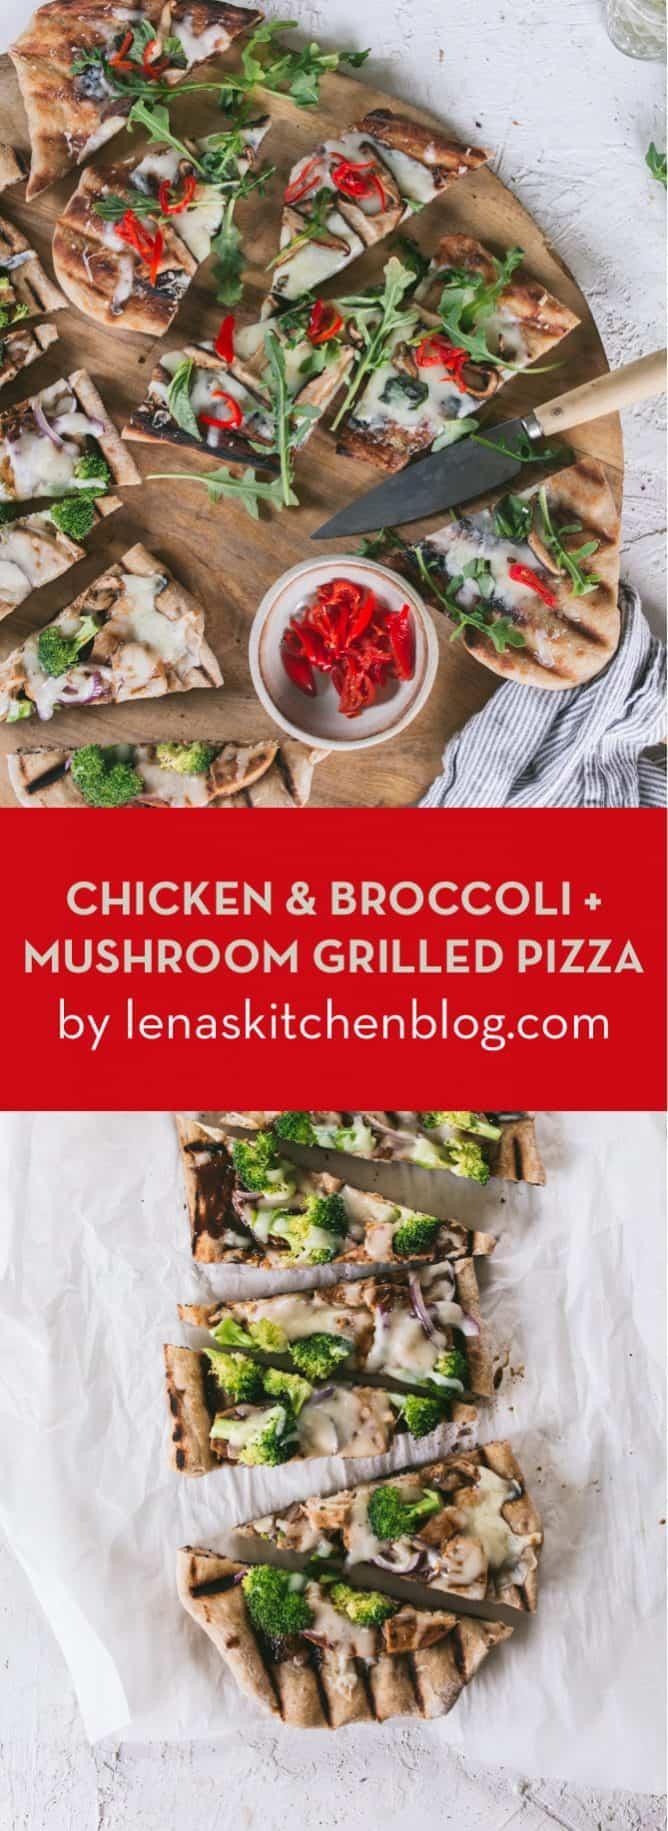 CHICKEN & BROCCOLI + MUSHROOM GRILLED PIZZA